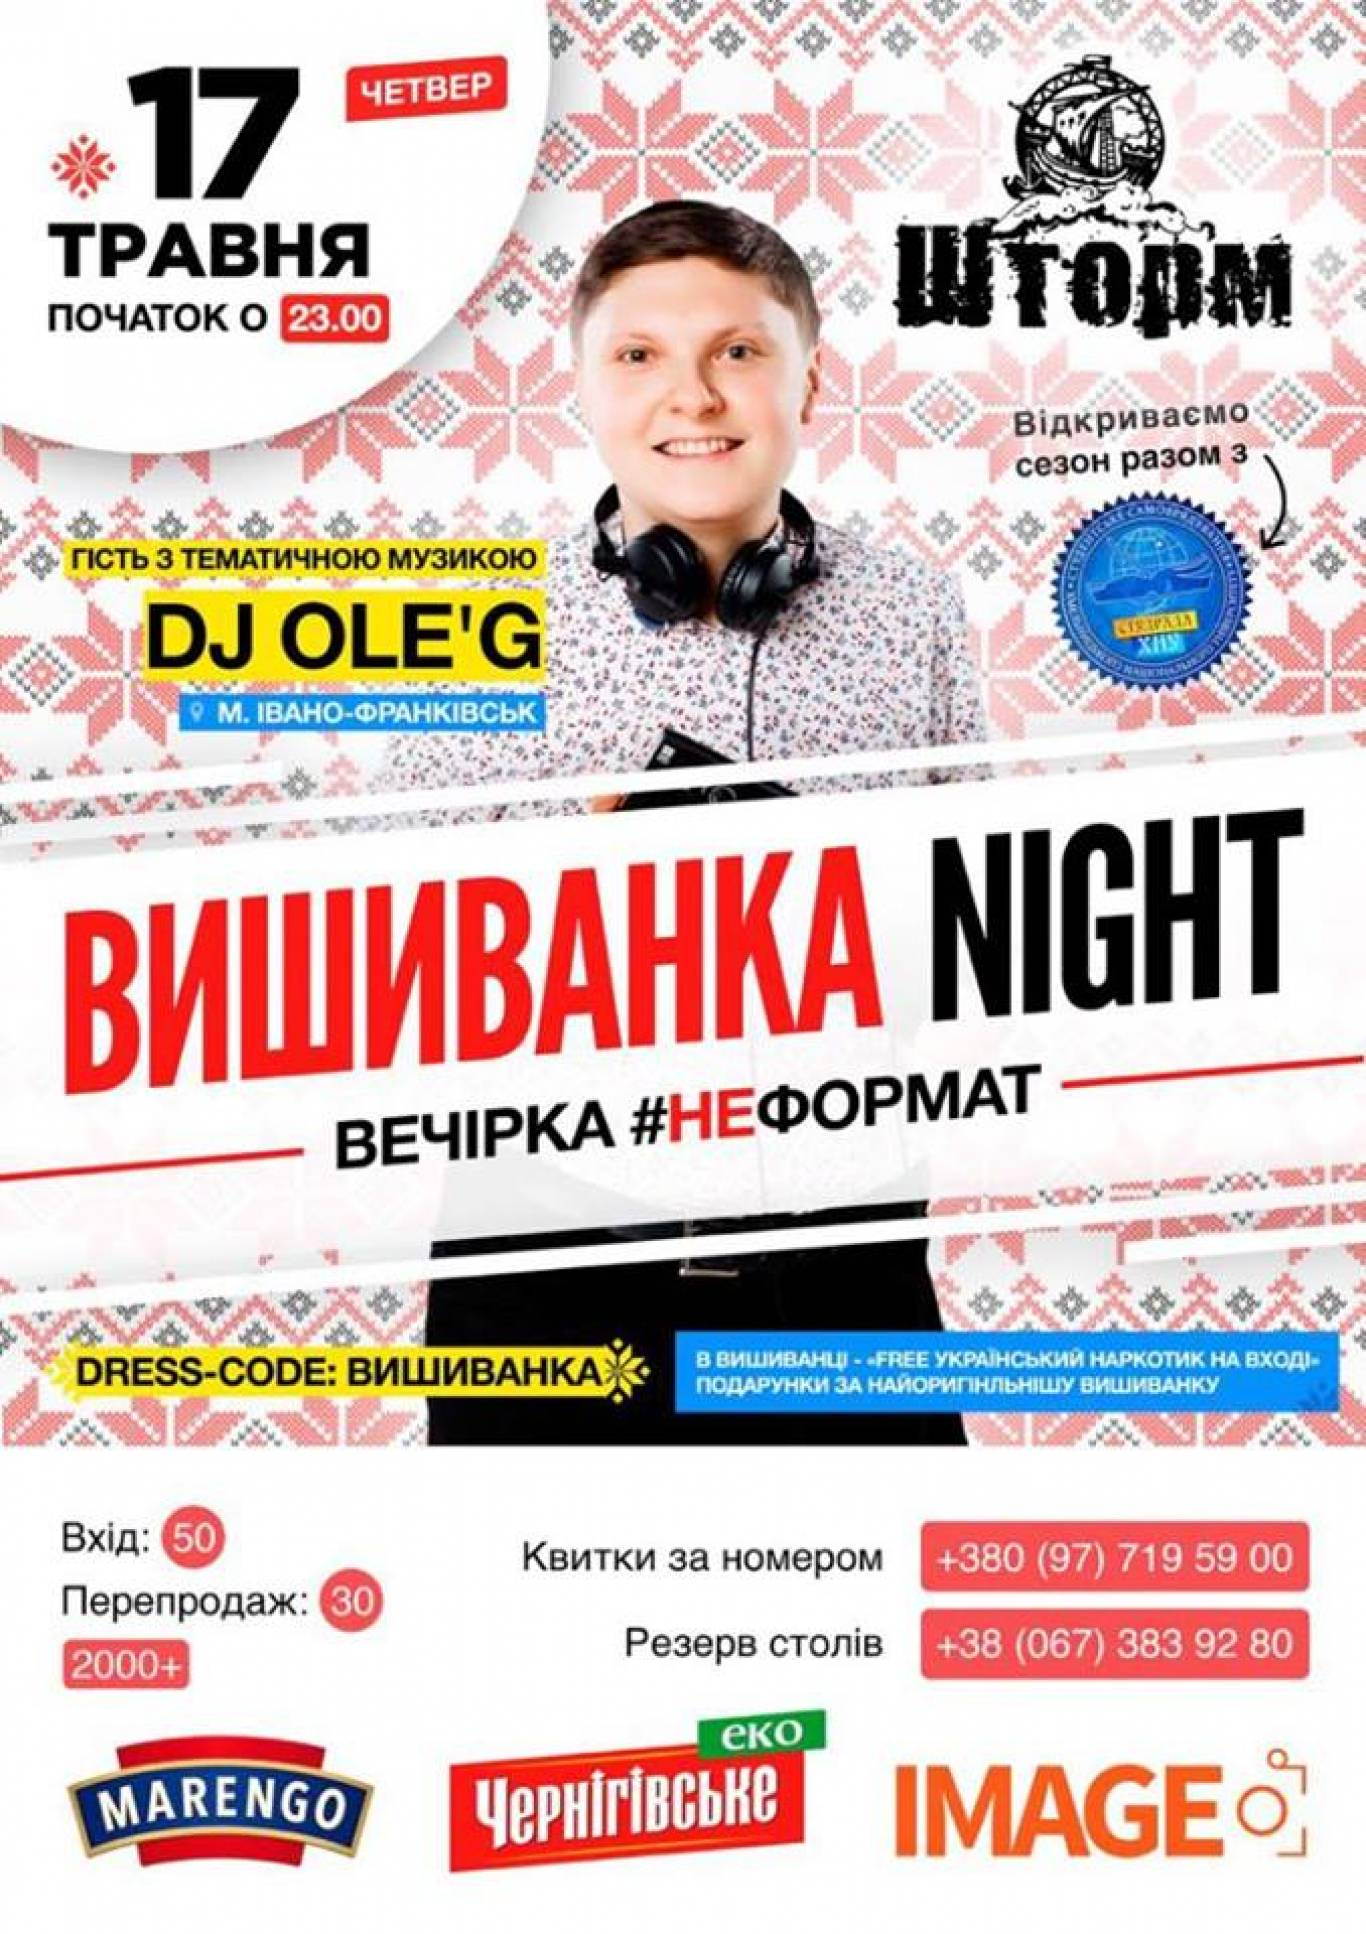 Вишиванка Night 17-05-2018 - Афіша Хмельницького - moemisto.ua. 31724442656ca